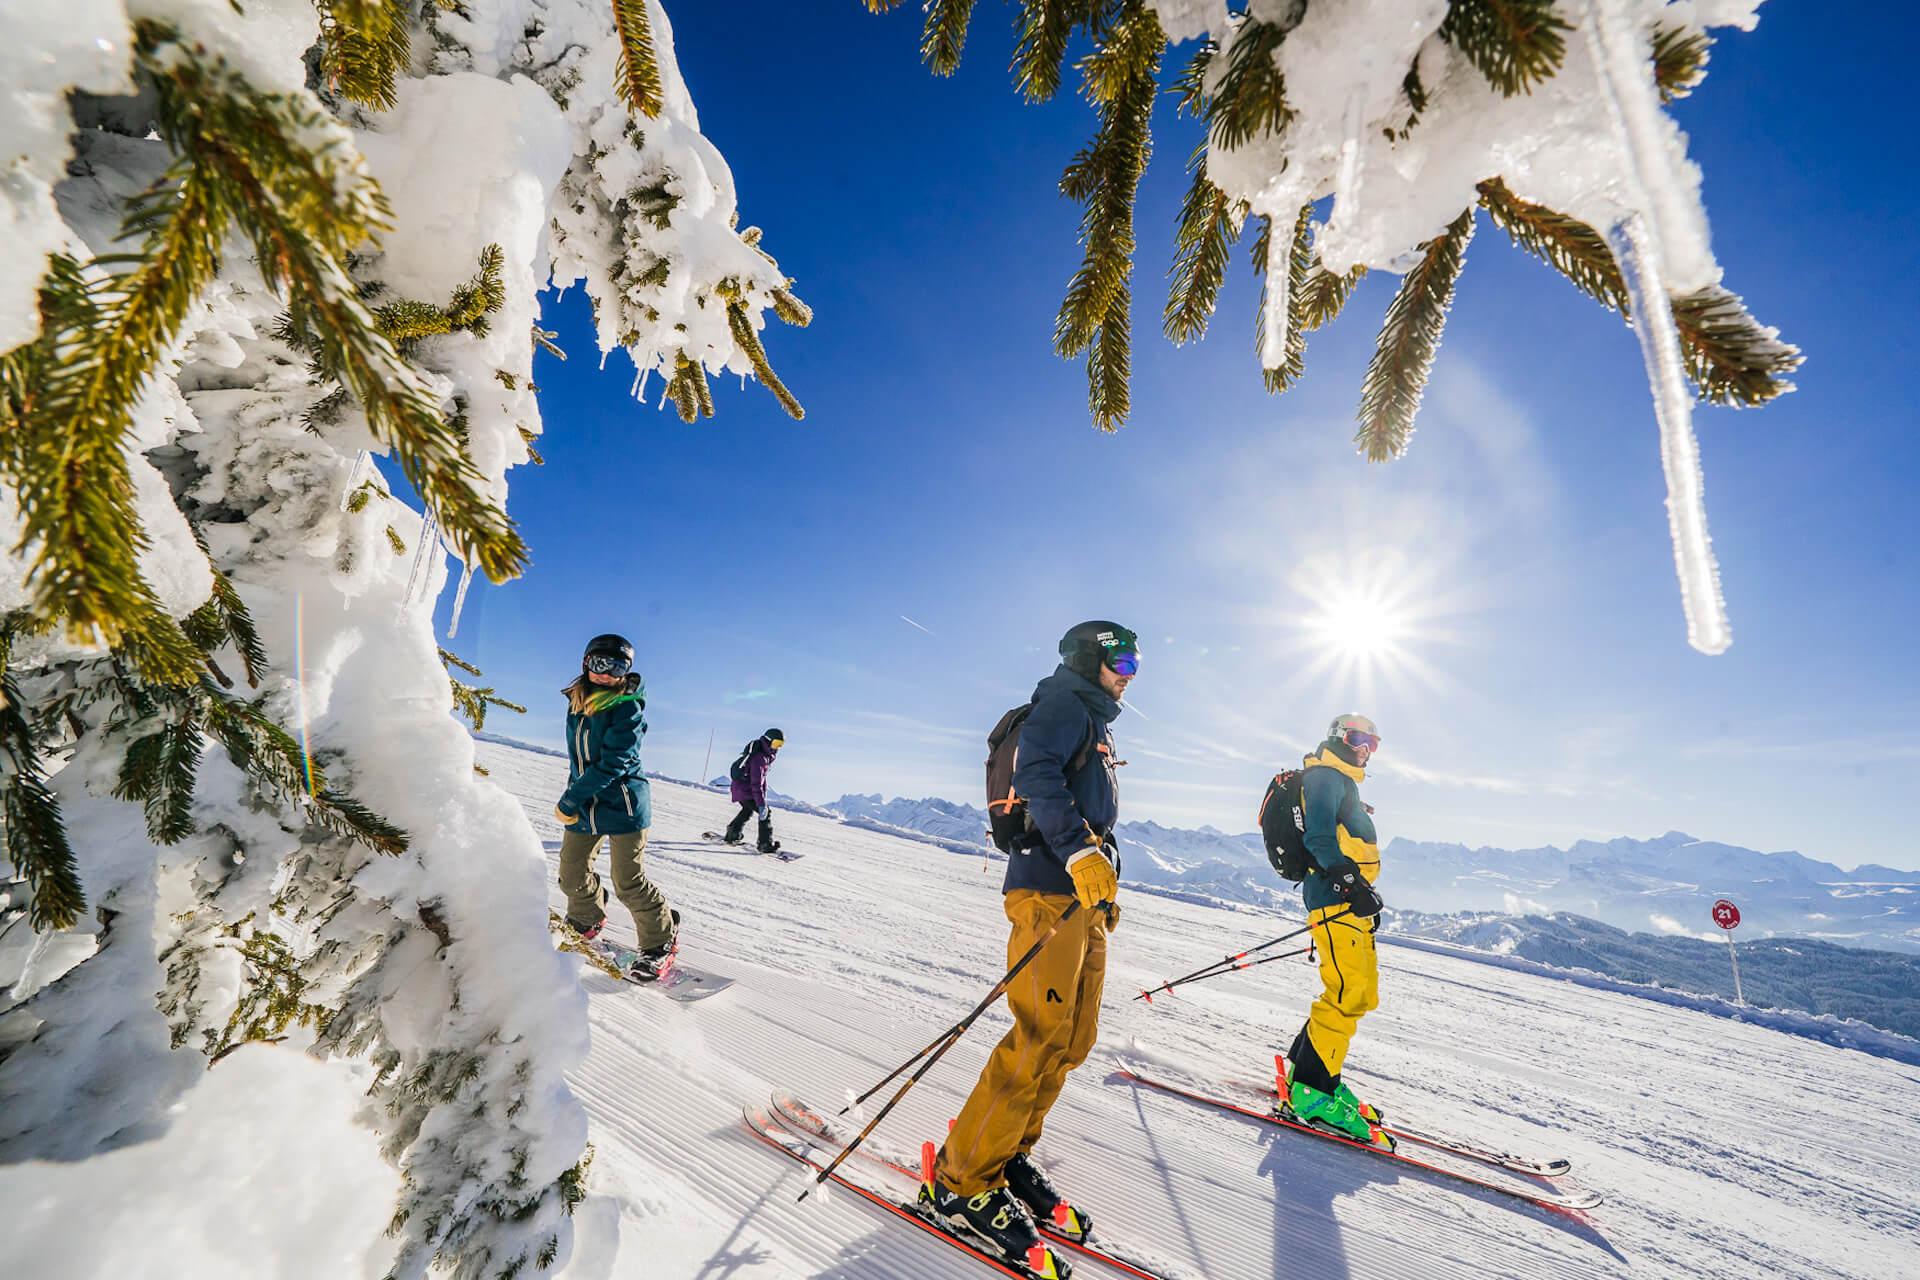 Ski – Winter sports